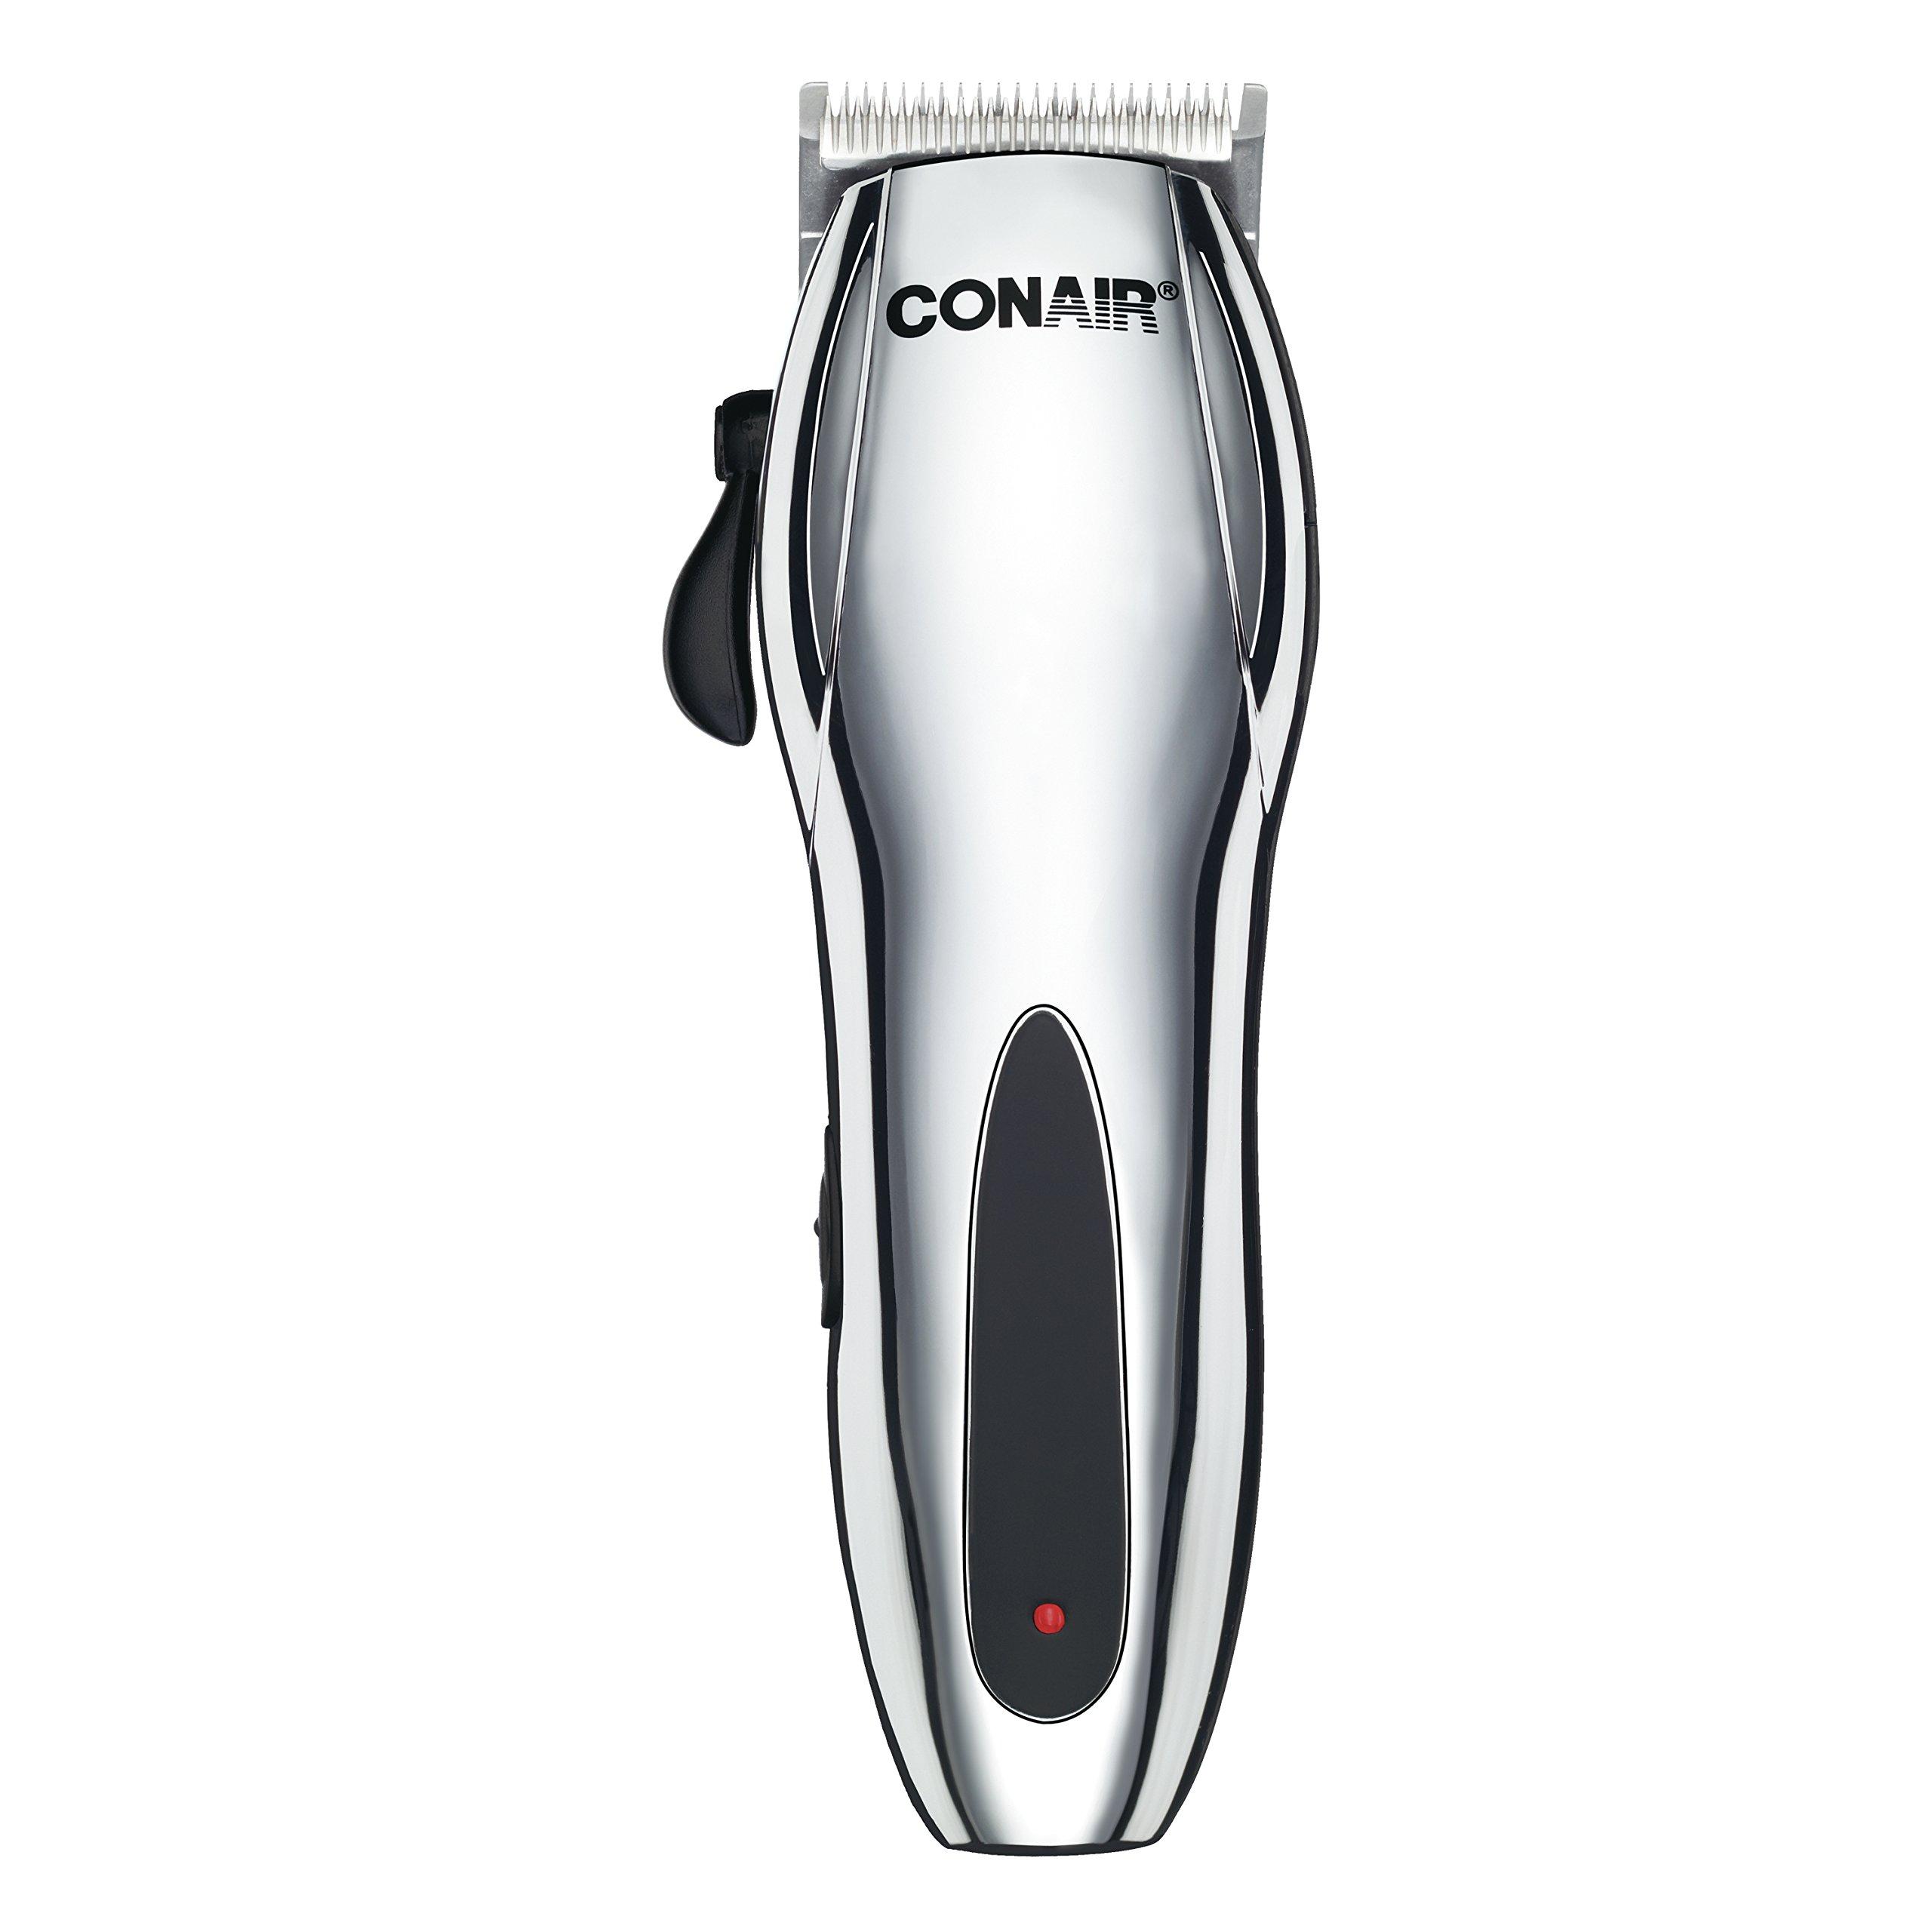 Conair Cord/Cordless Rechargeable 22-piece Haircut Kit; Home Hair Cutting Kit; Chrome